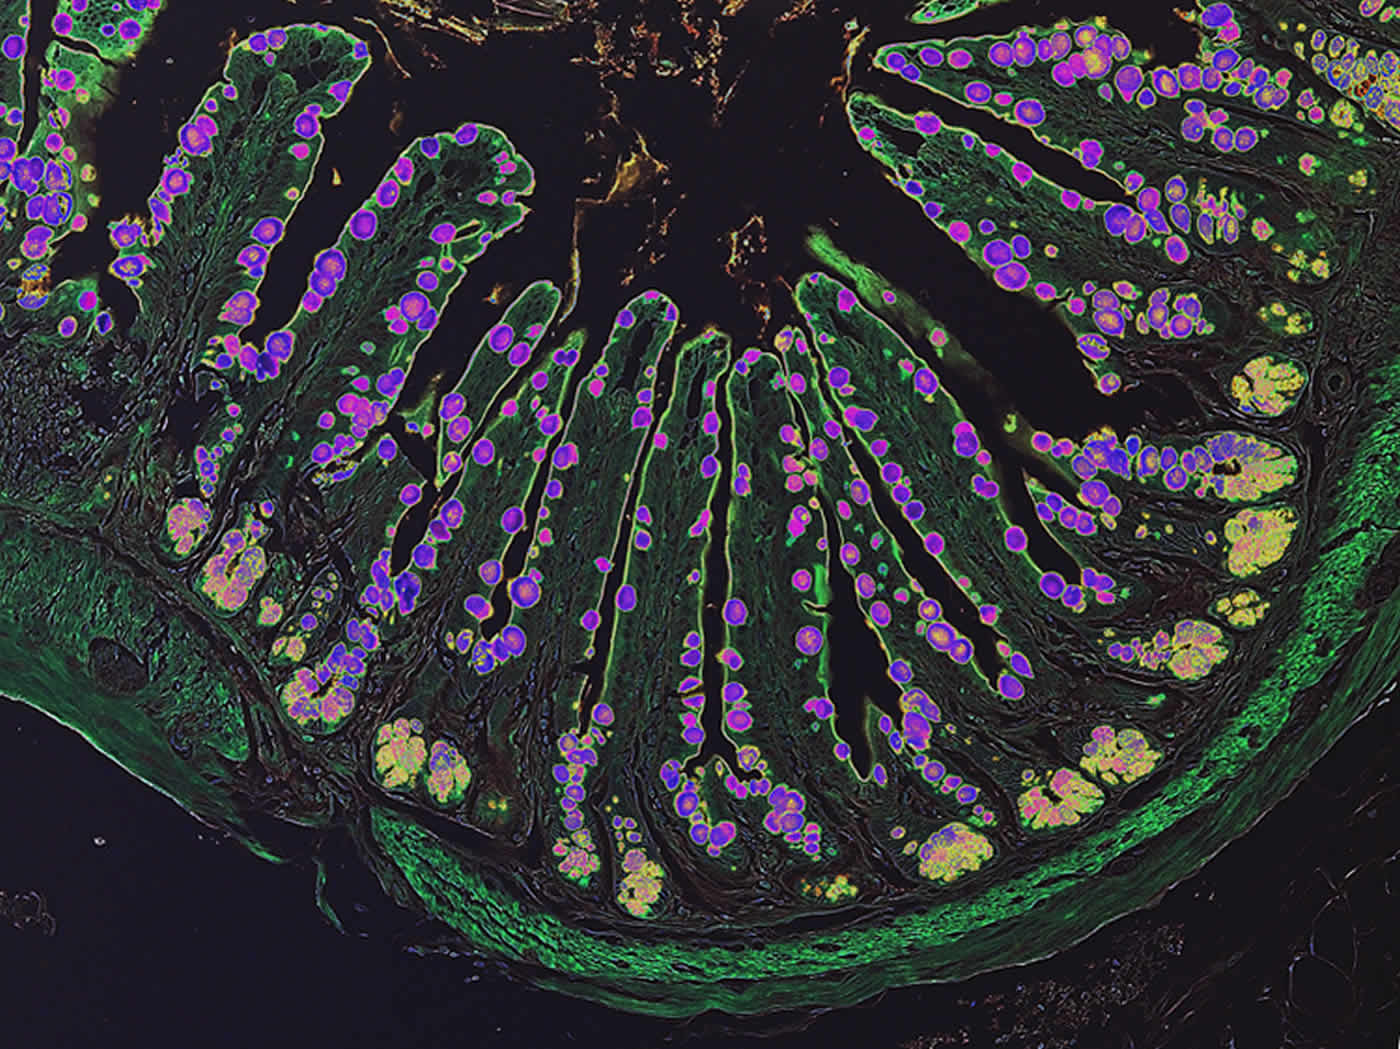 Image shows intestinal inflammation.